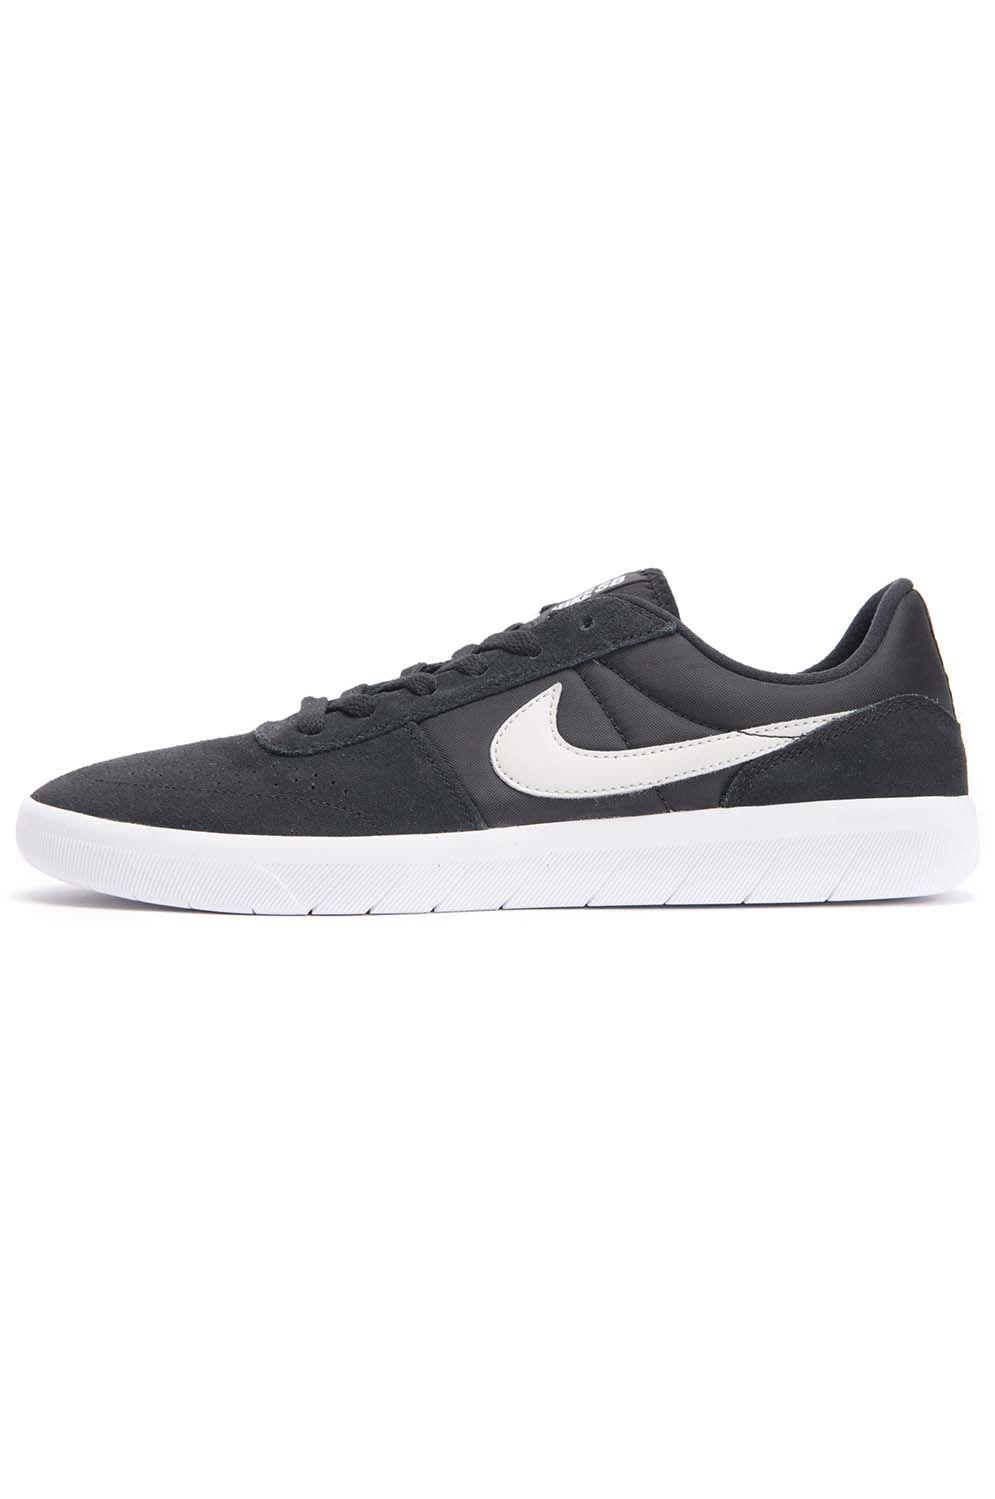 Tenis Nike Sb TEAM CLASSIC Black/Lt Bone-White